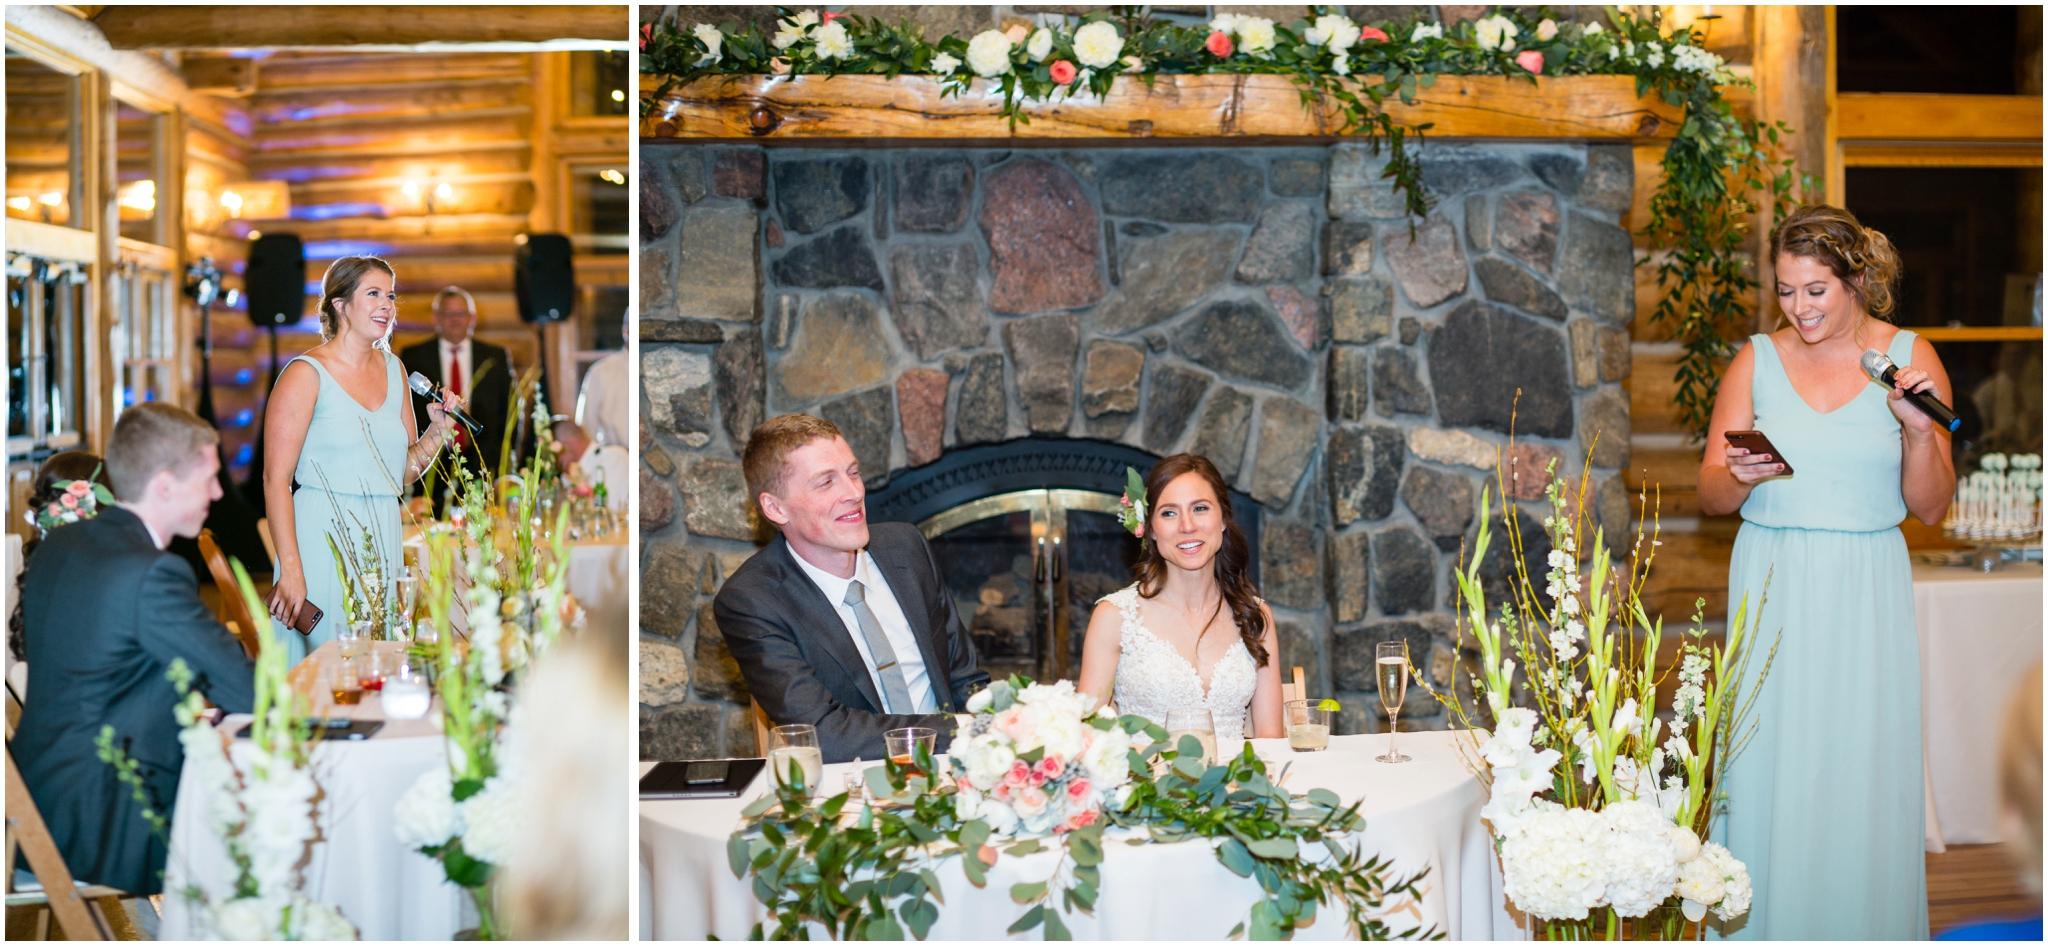 Evergreen_Lake_house_Wedding_Photography.JPG